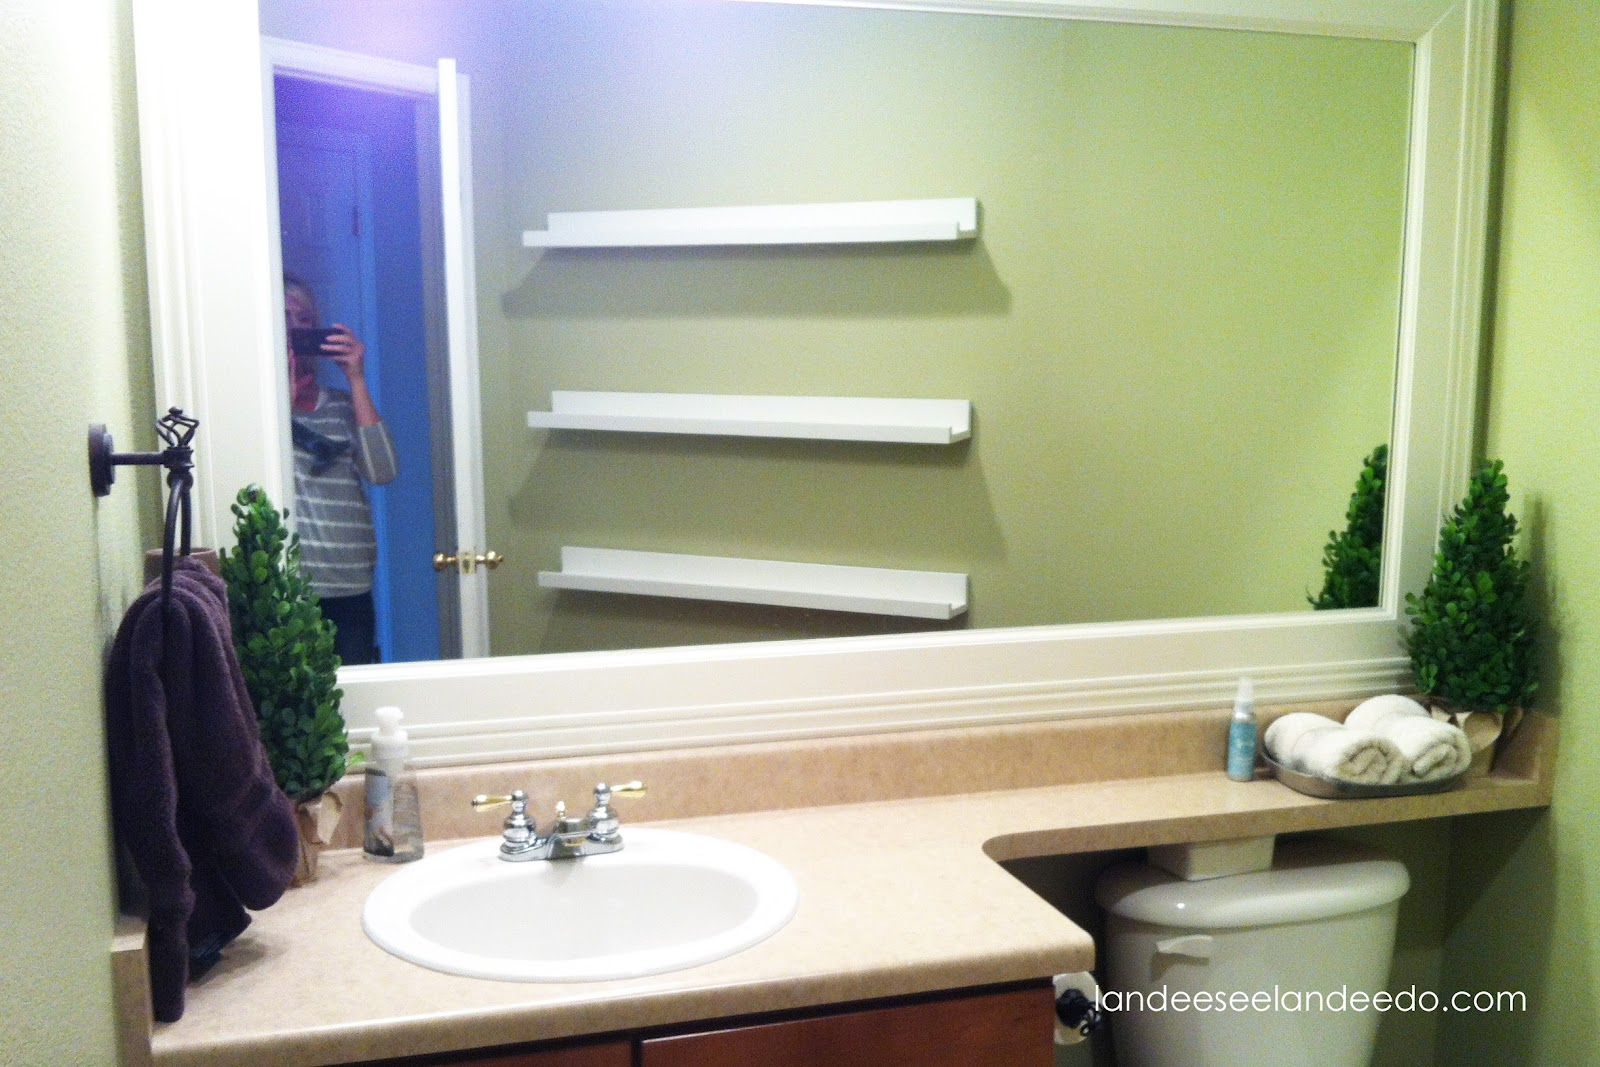 Bathroom Ledge Shelf. Water Under Tiles In Bathroom